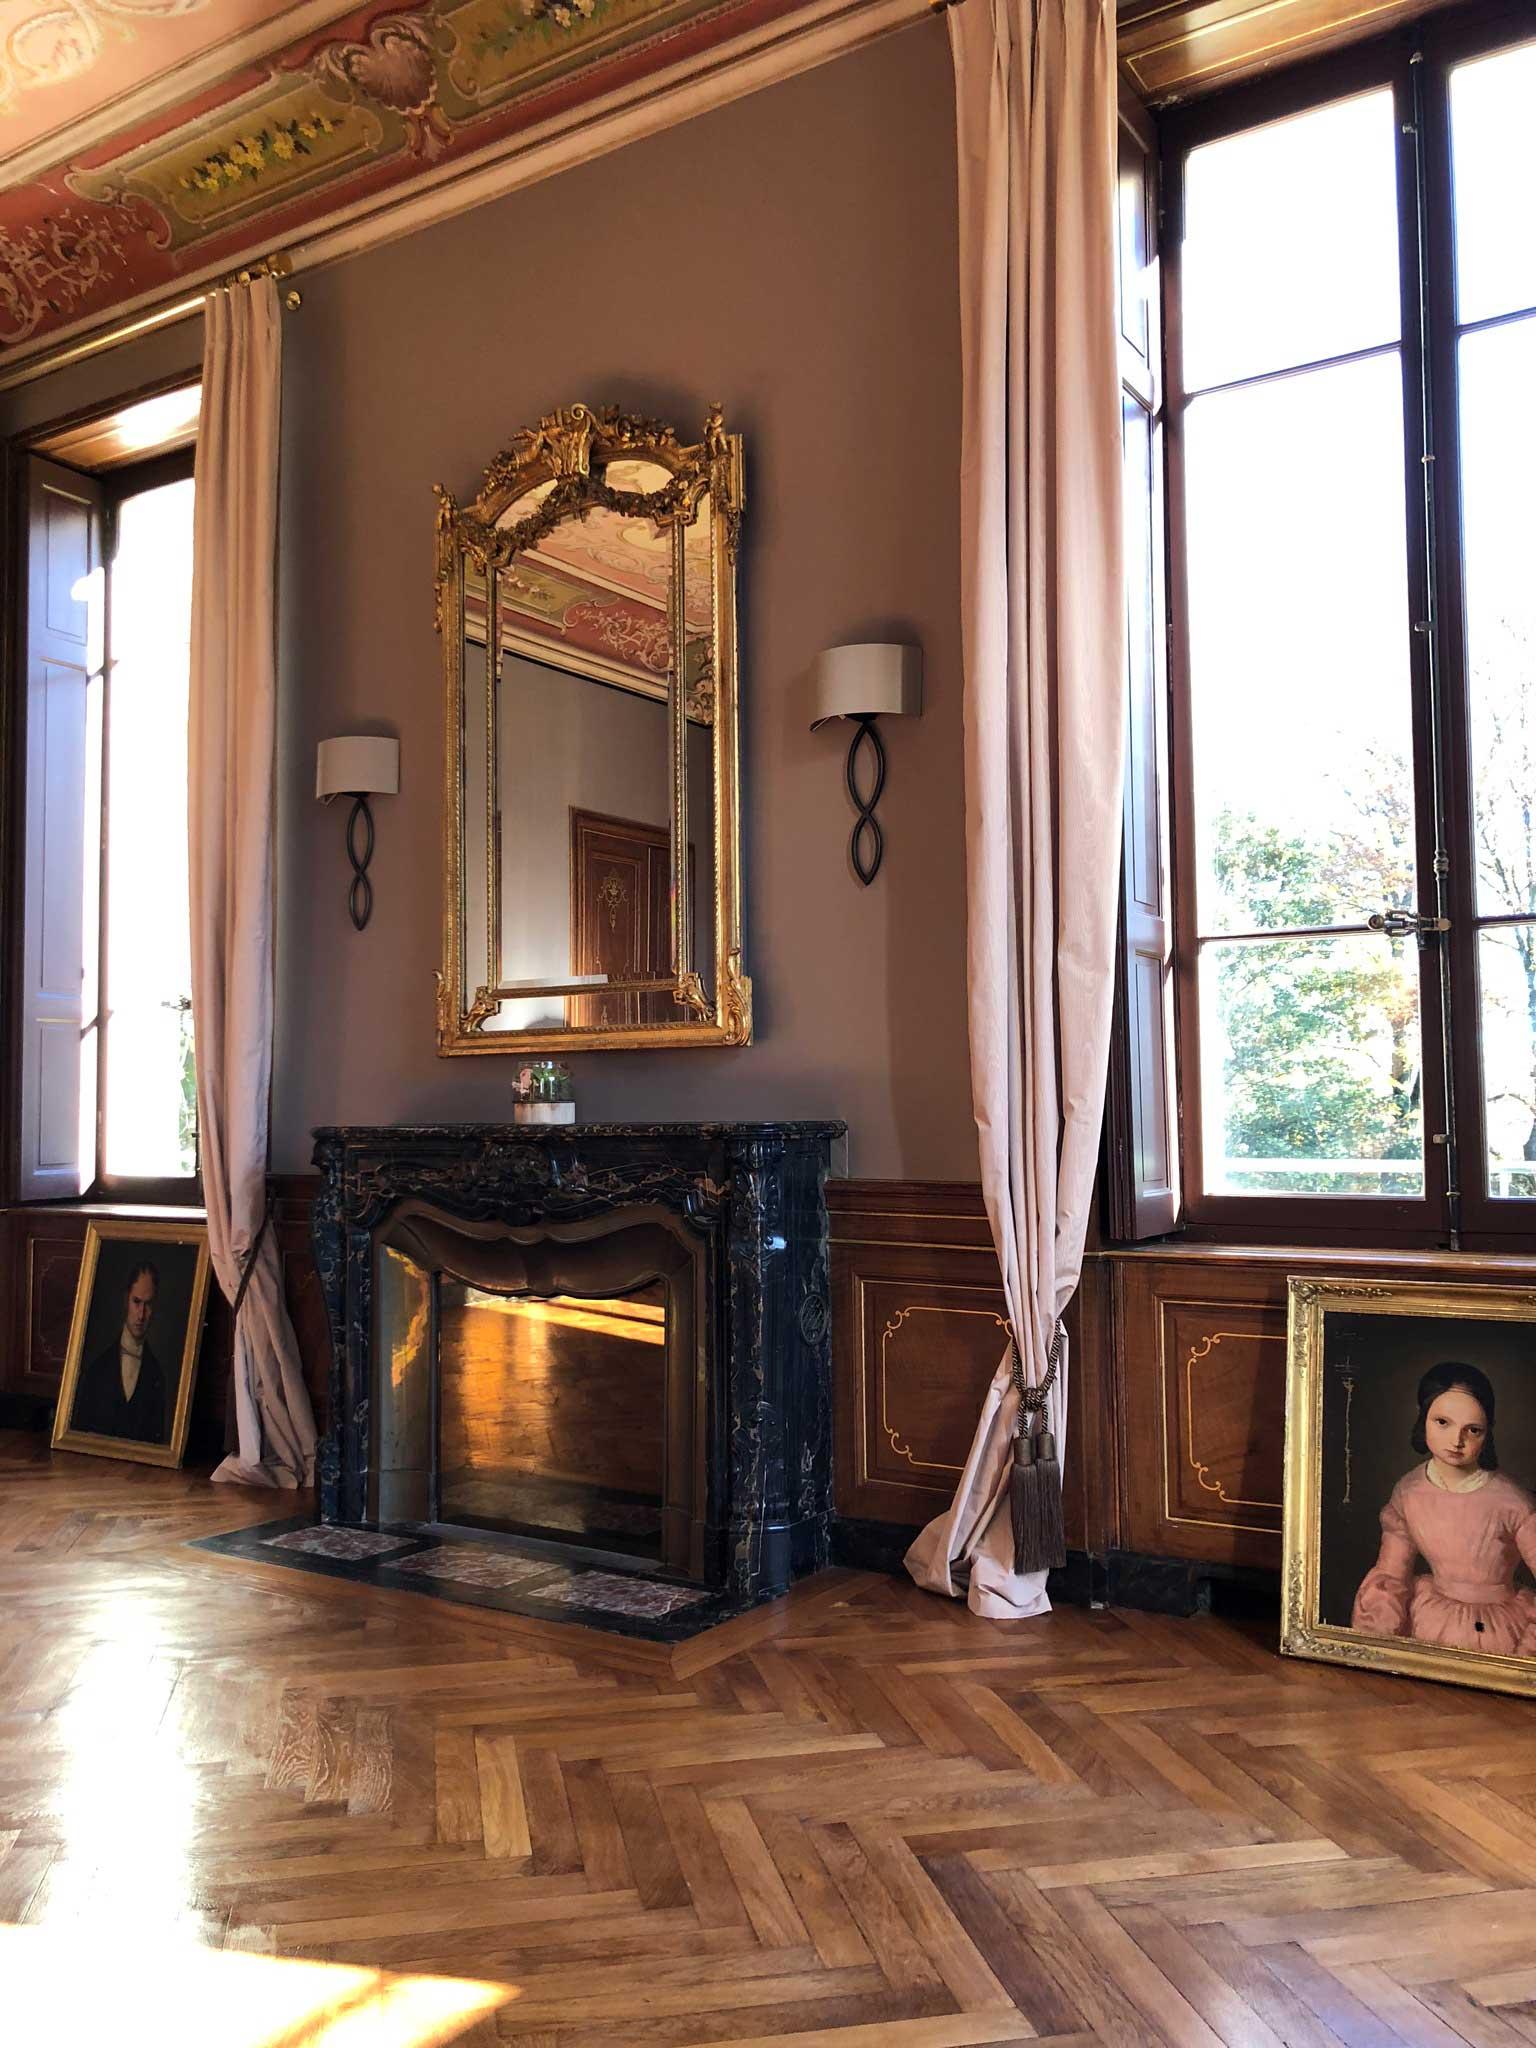 iria degen interiors chateau-de-montcaud france_12.jpg